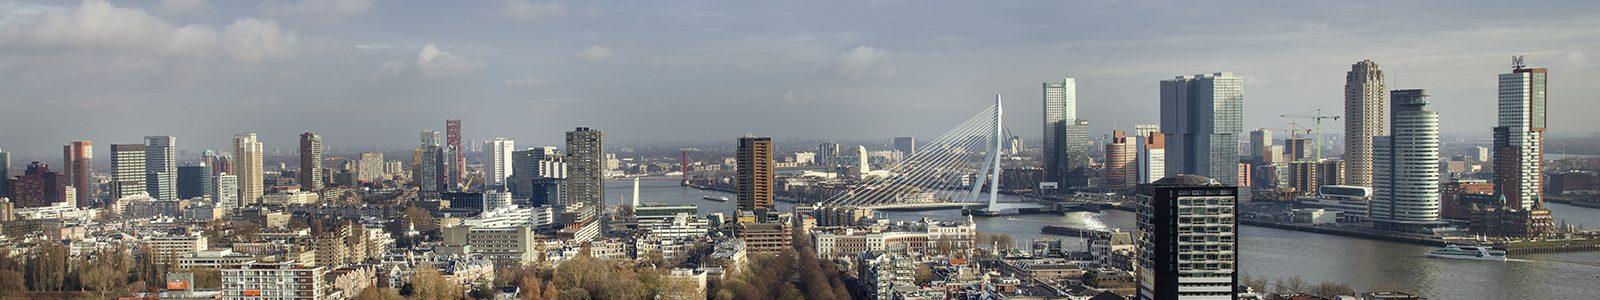 rotterdam_skyline